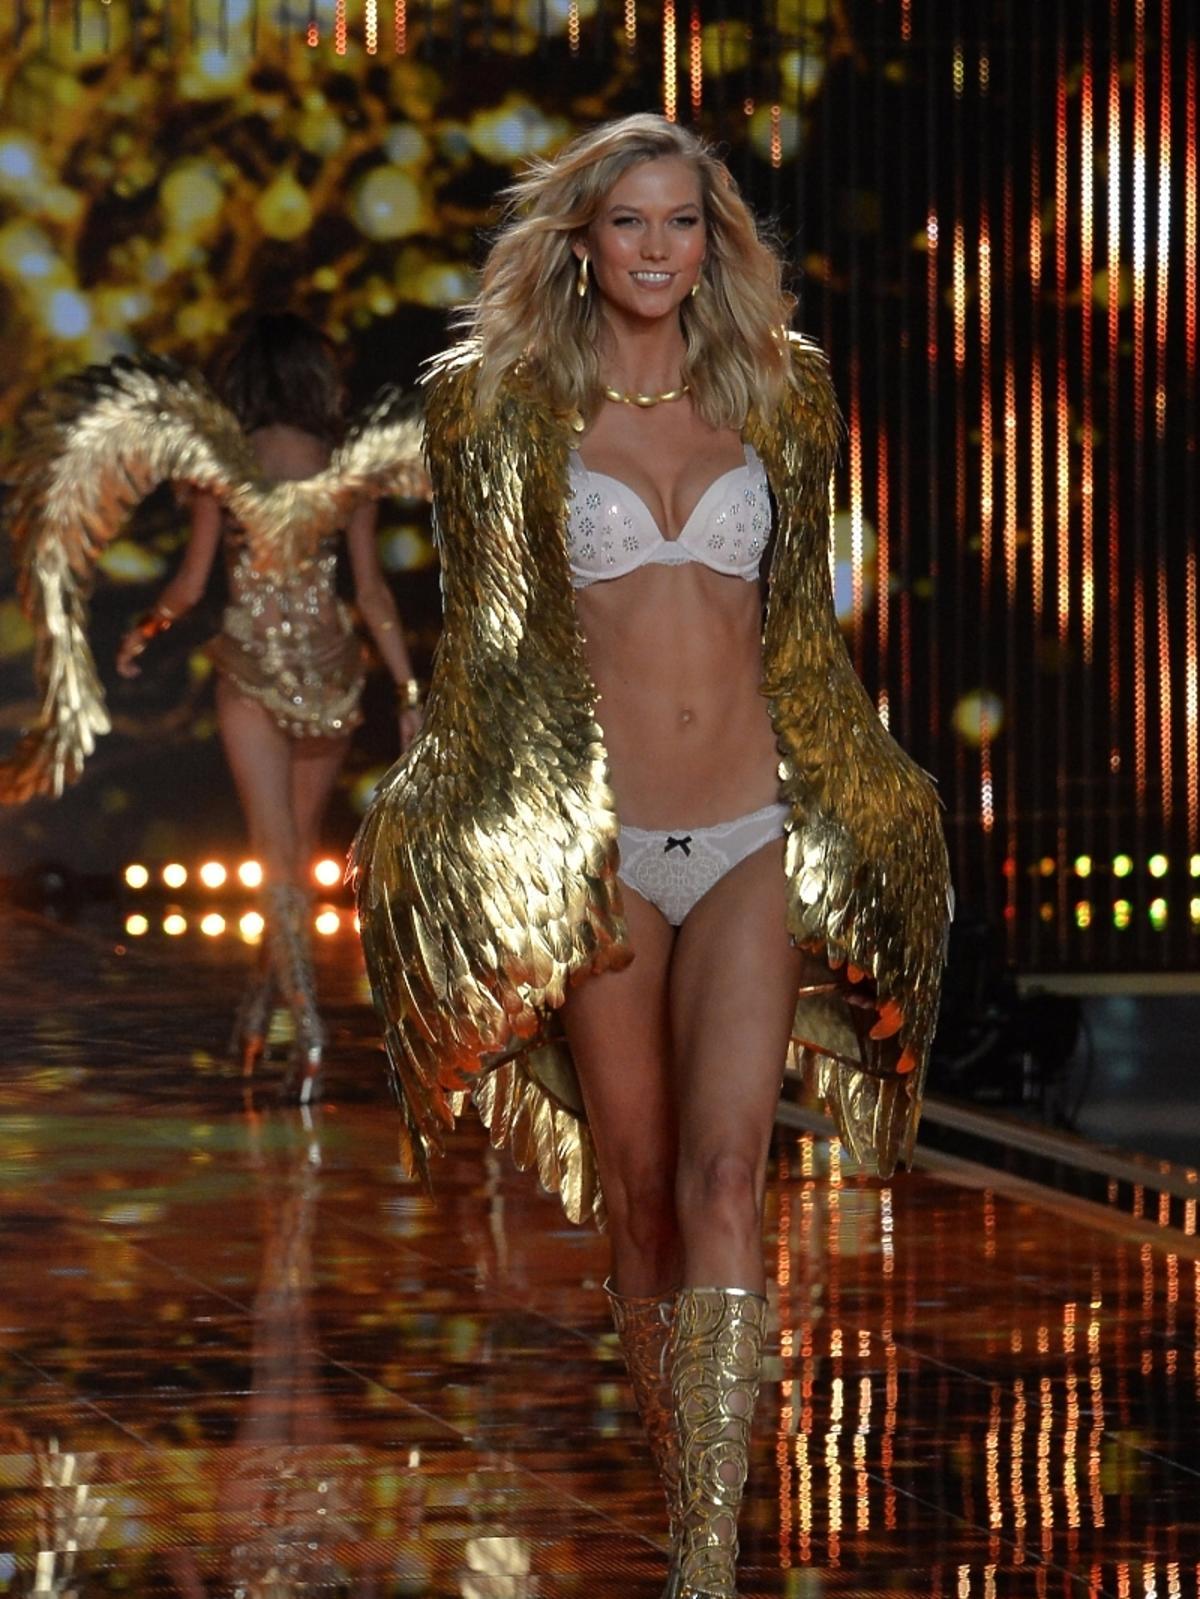 Victoria's Secret Show 2014 - Karlie Kloss